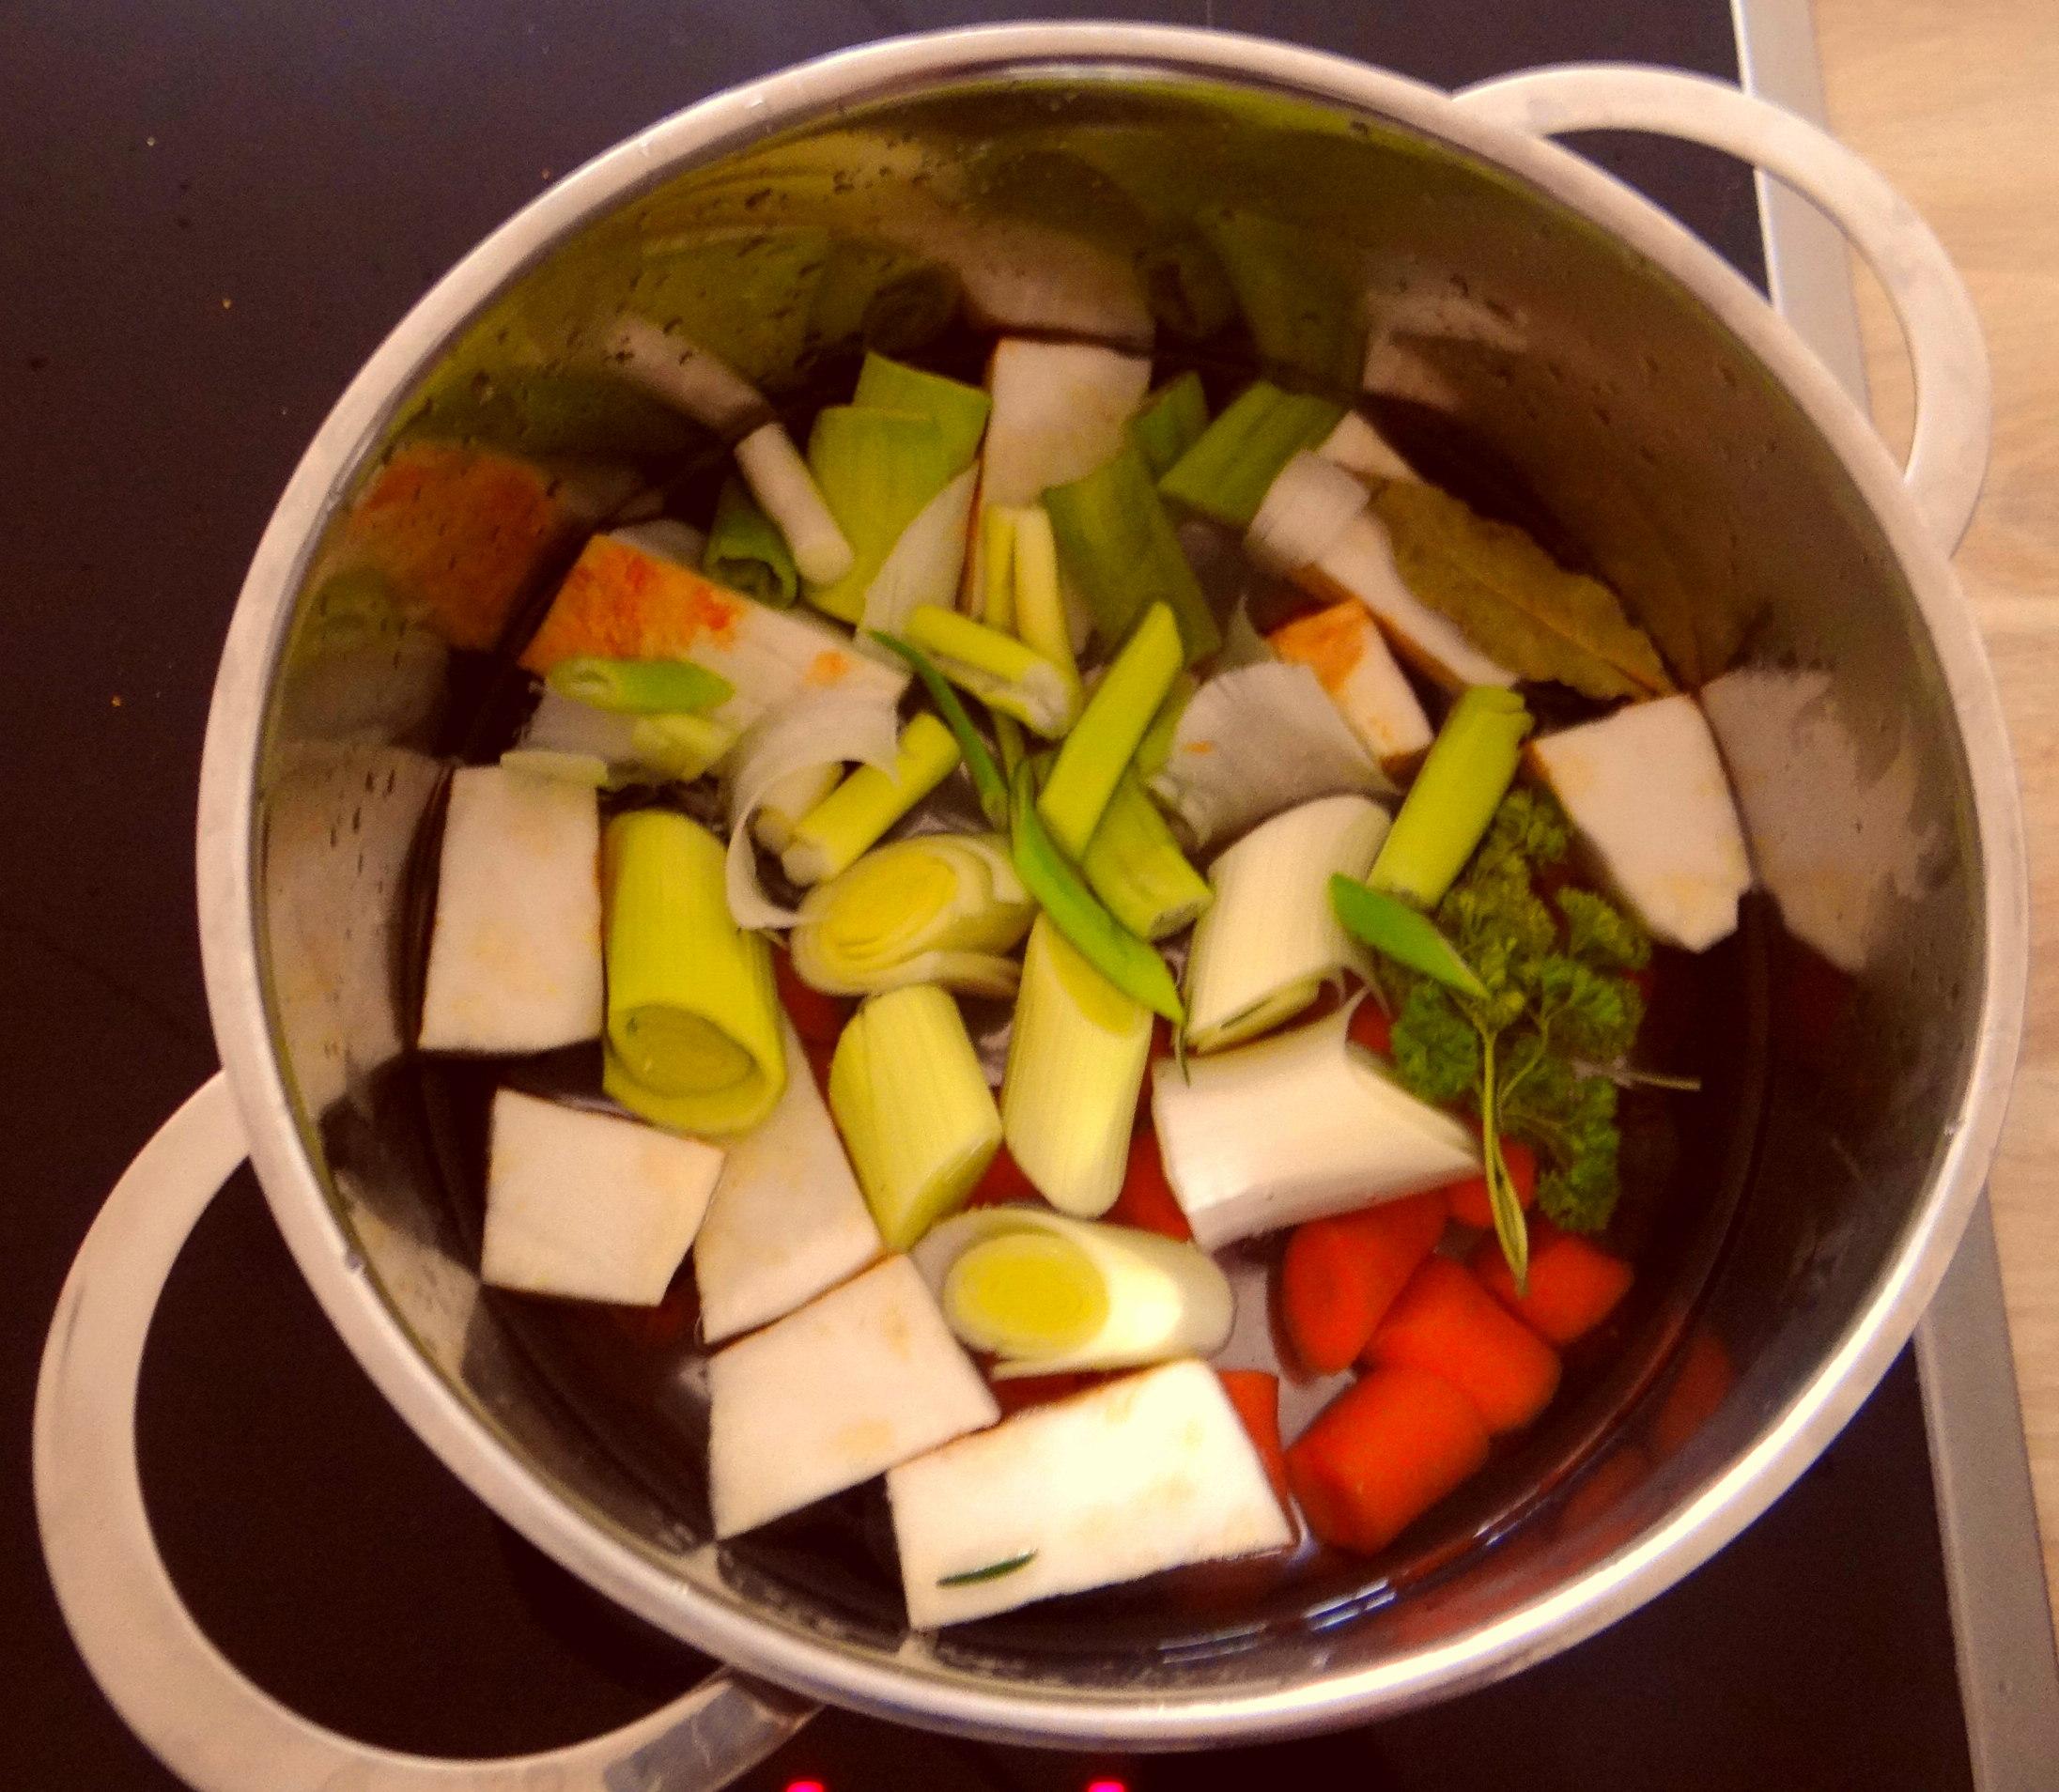 Austernpilz Risotto,Chamignon,Käse Cräcker,Salat,Quitten (8)